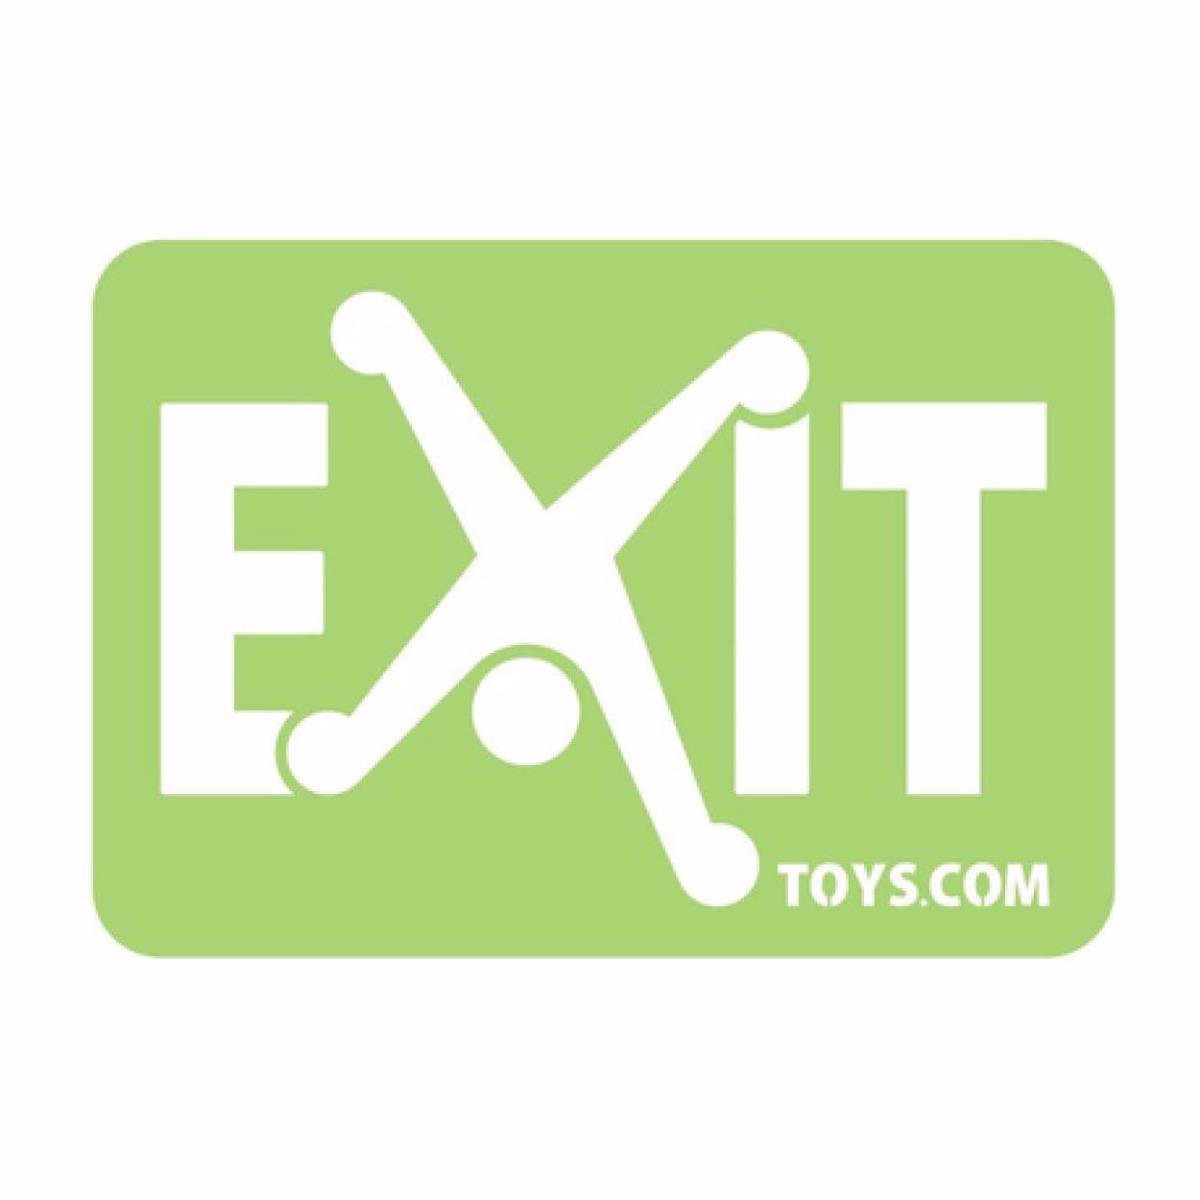 exit trampolines logo